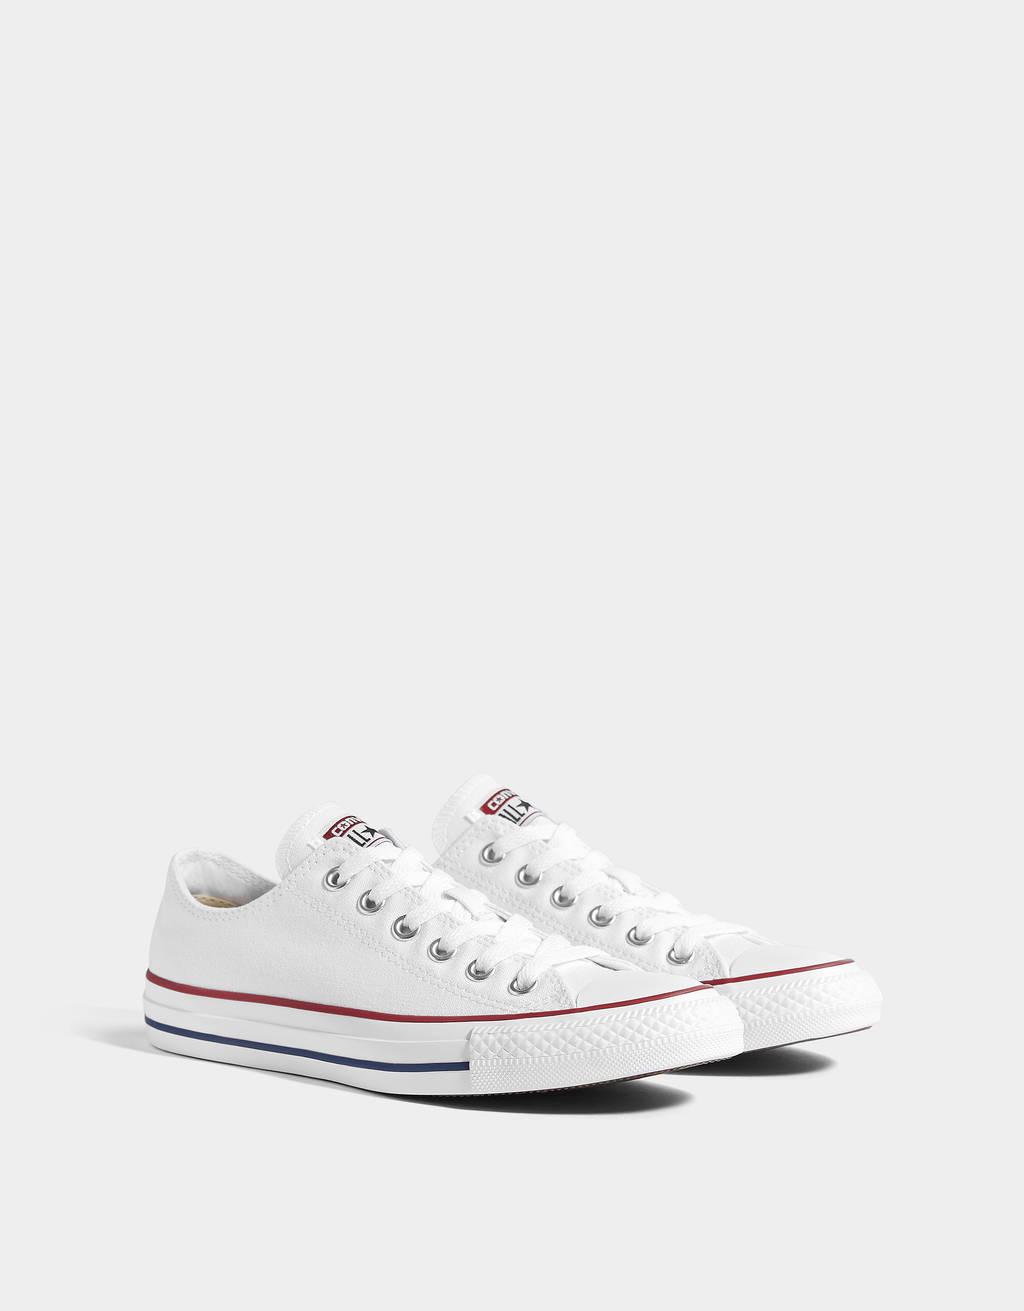 2016 Adidas Stan Smith Lady's men sneakers adidas STAN SMITH S75104 RWHTRWHTRWHT sneakers sneaker